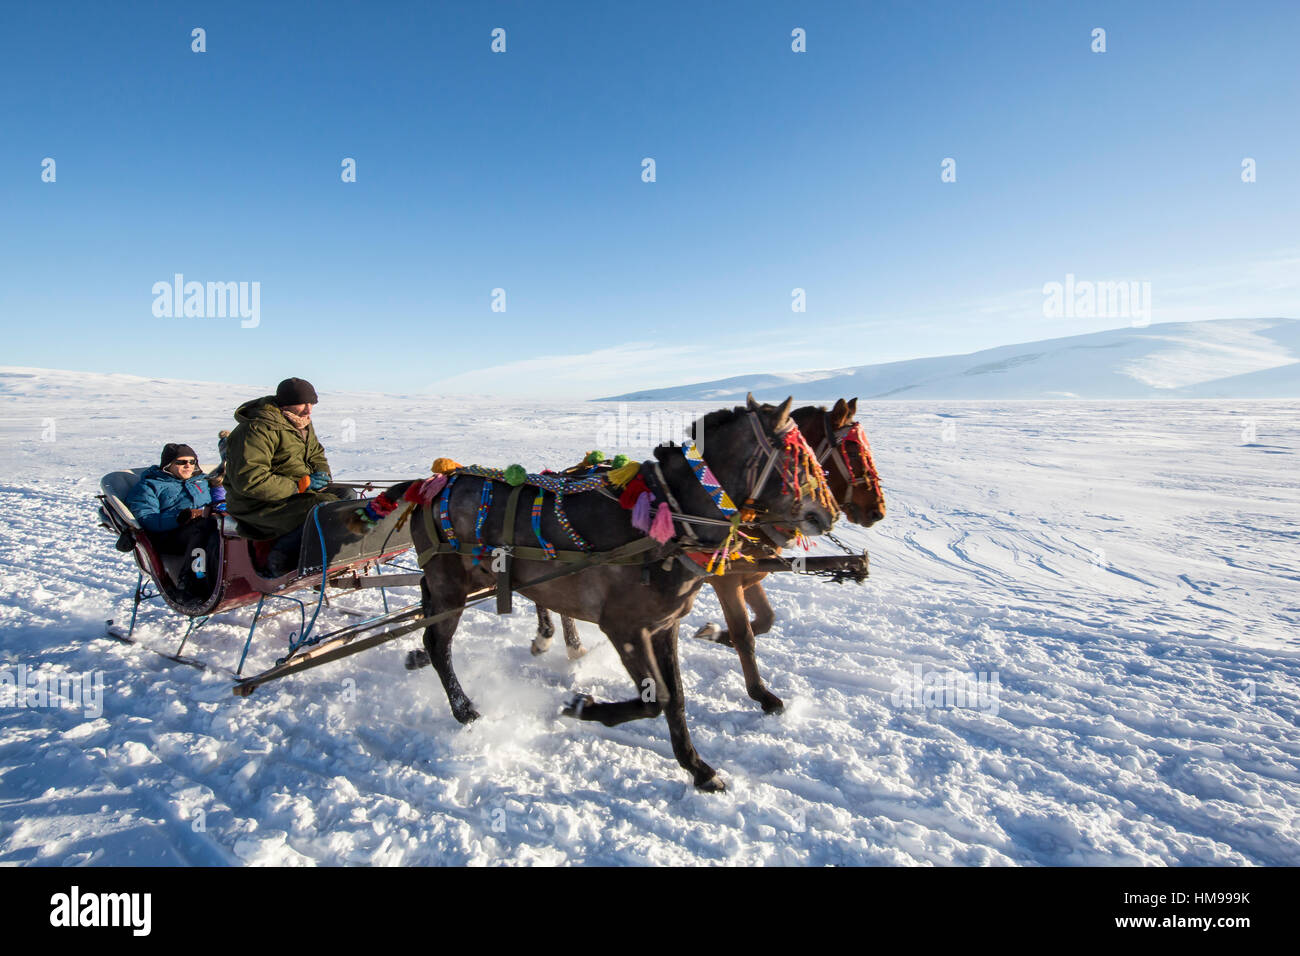 Ardahan, Turkey - January 14, 2017: Sleigh on frozen Cildir lake in Ardahan city of Turkey onJanuary 14, 2017. - Stock Image